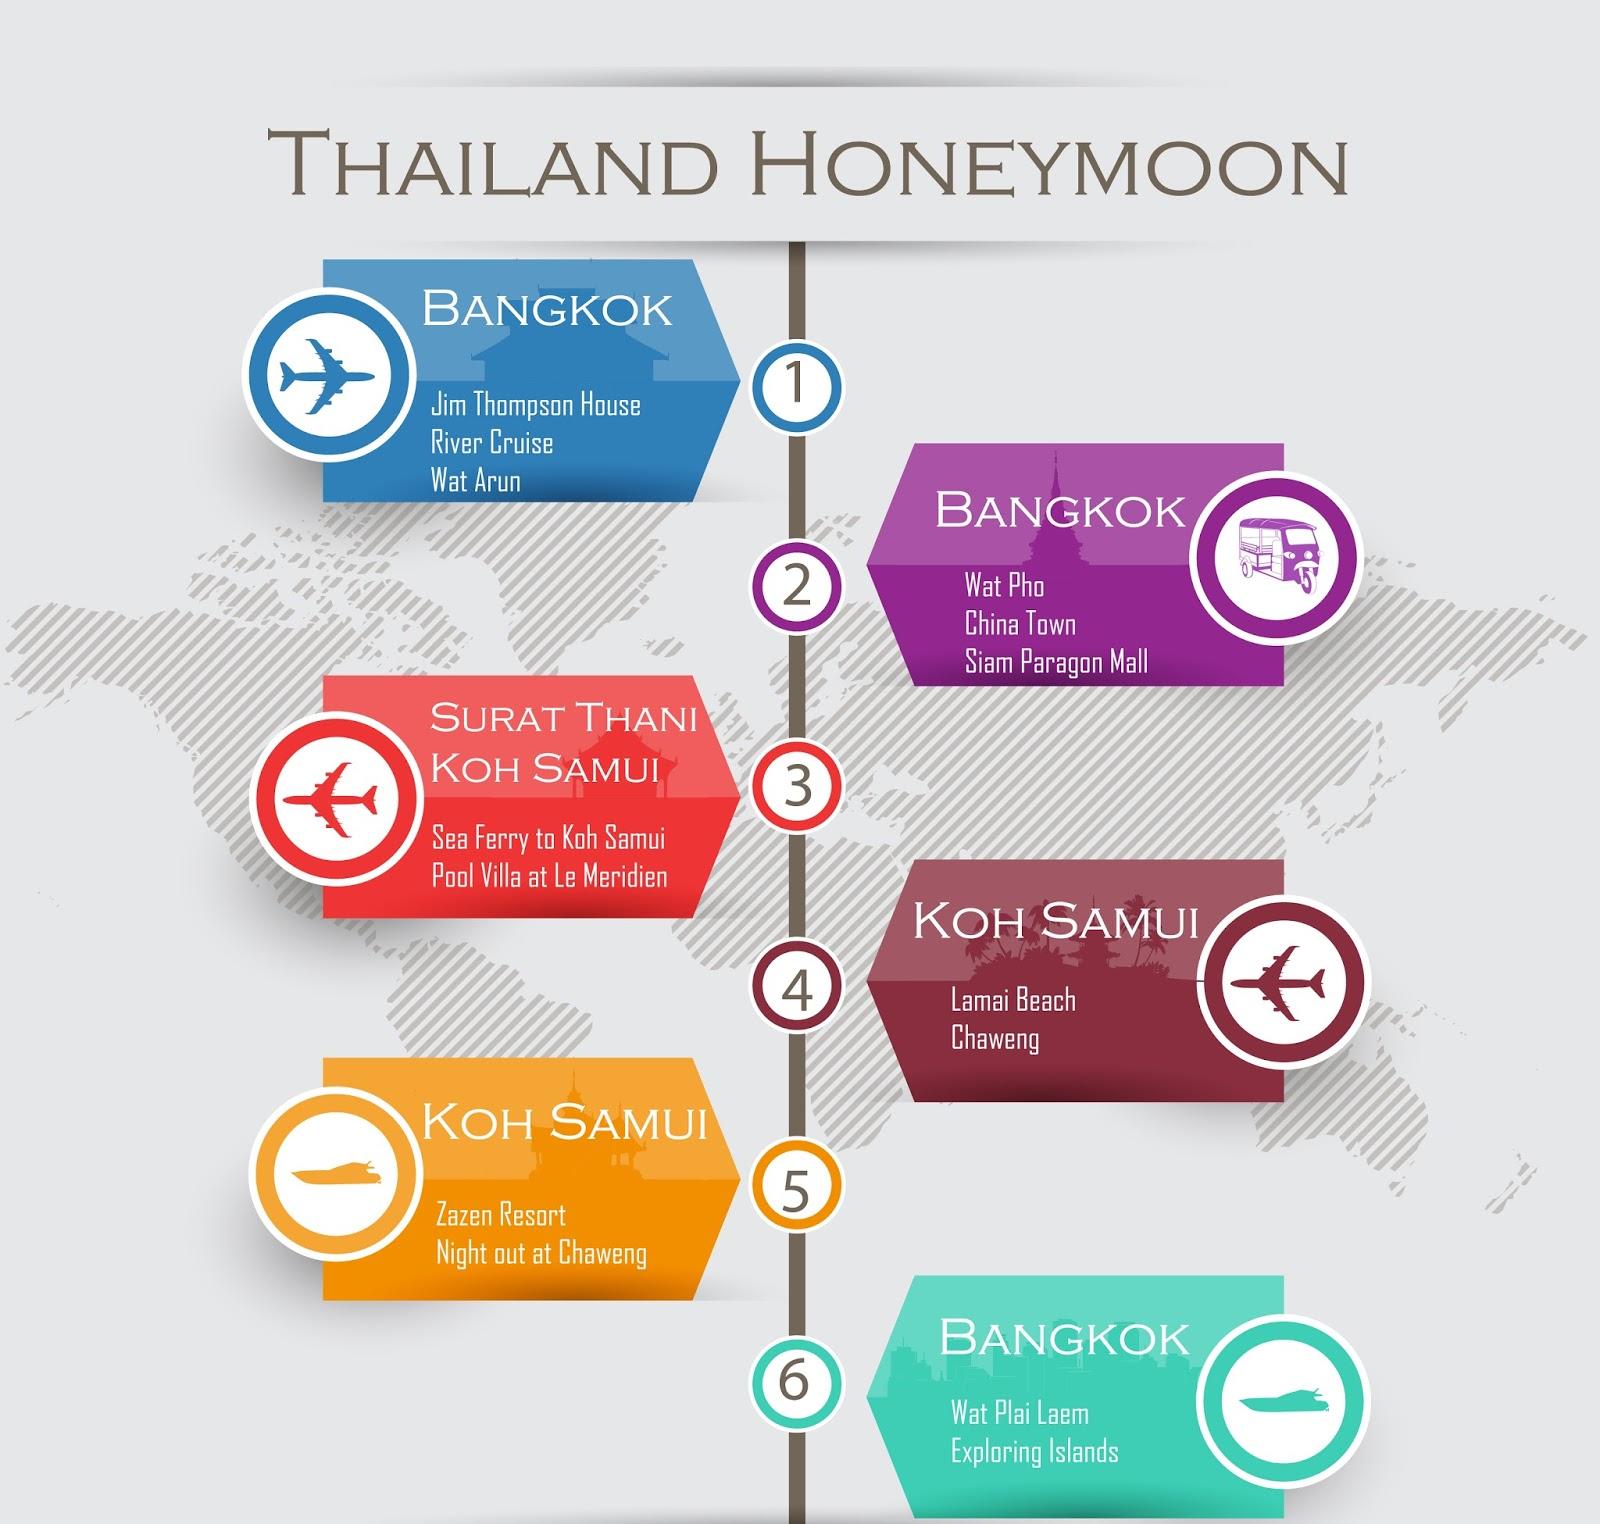 Thailand Honeymoon Itinerary